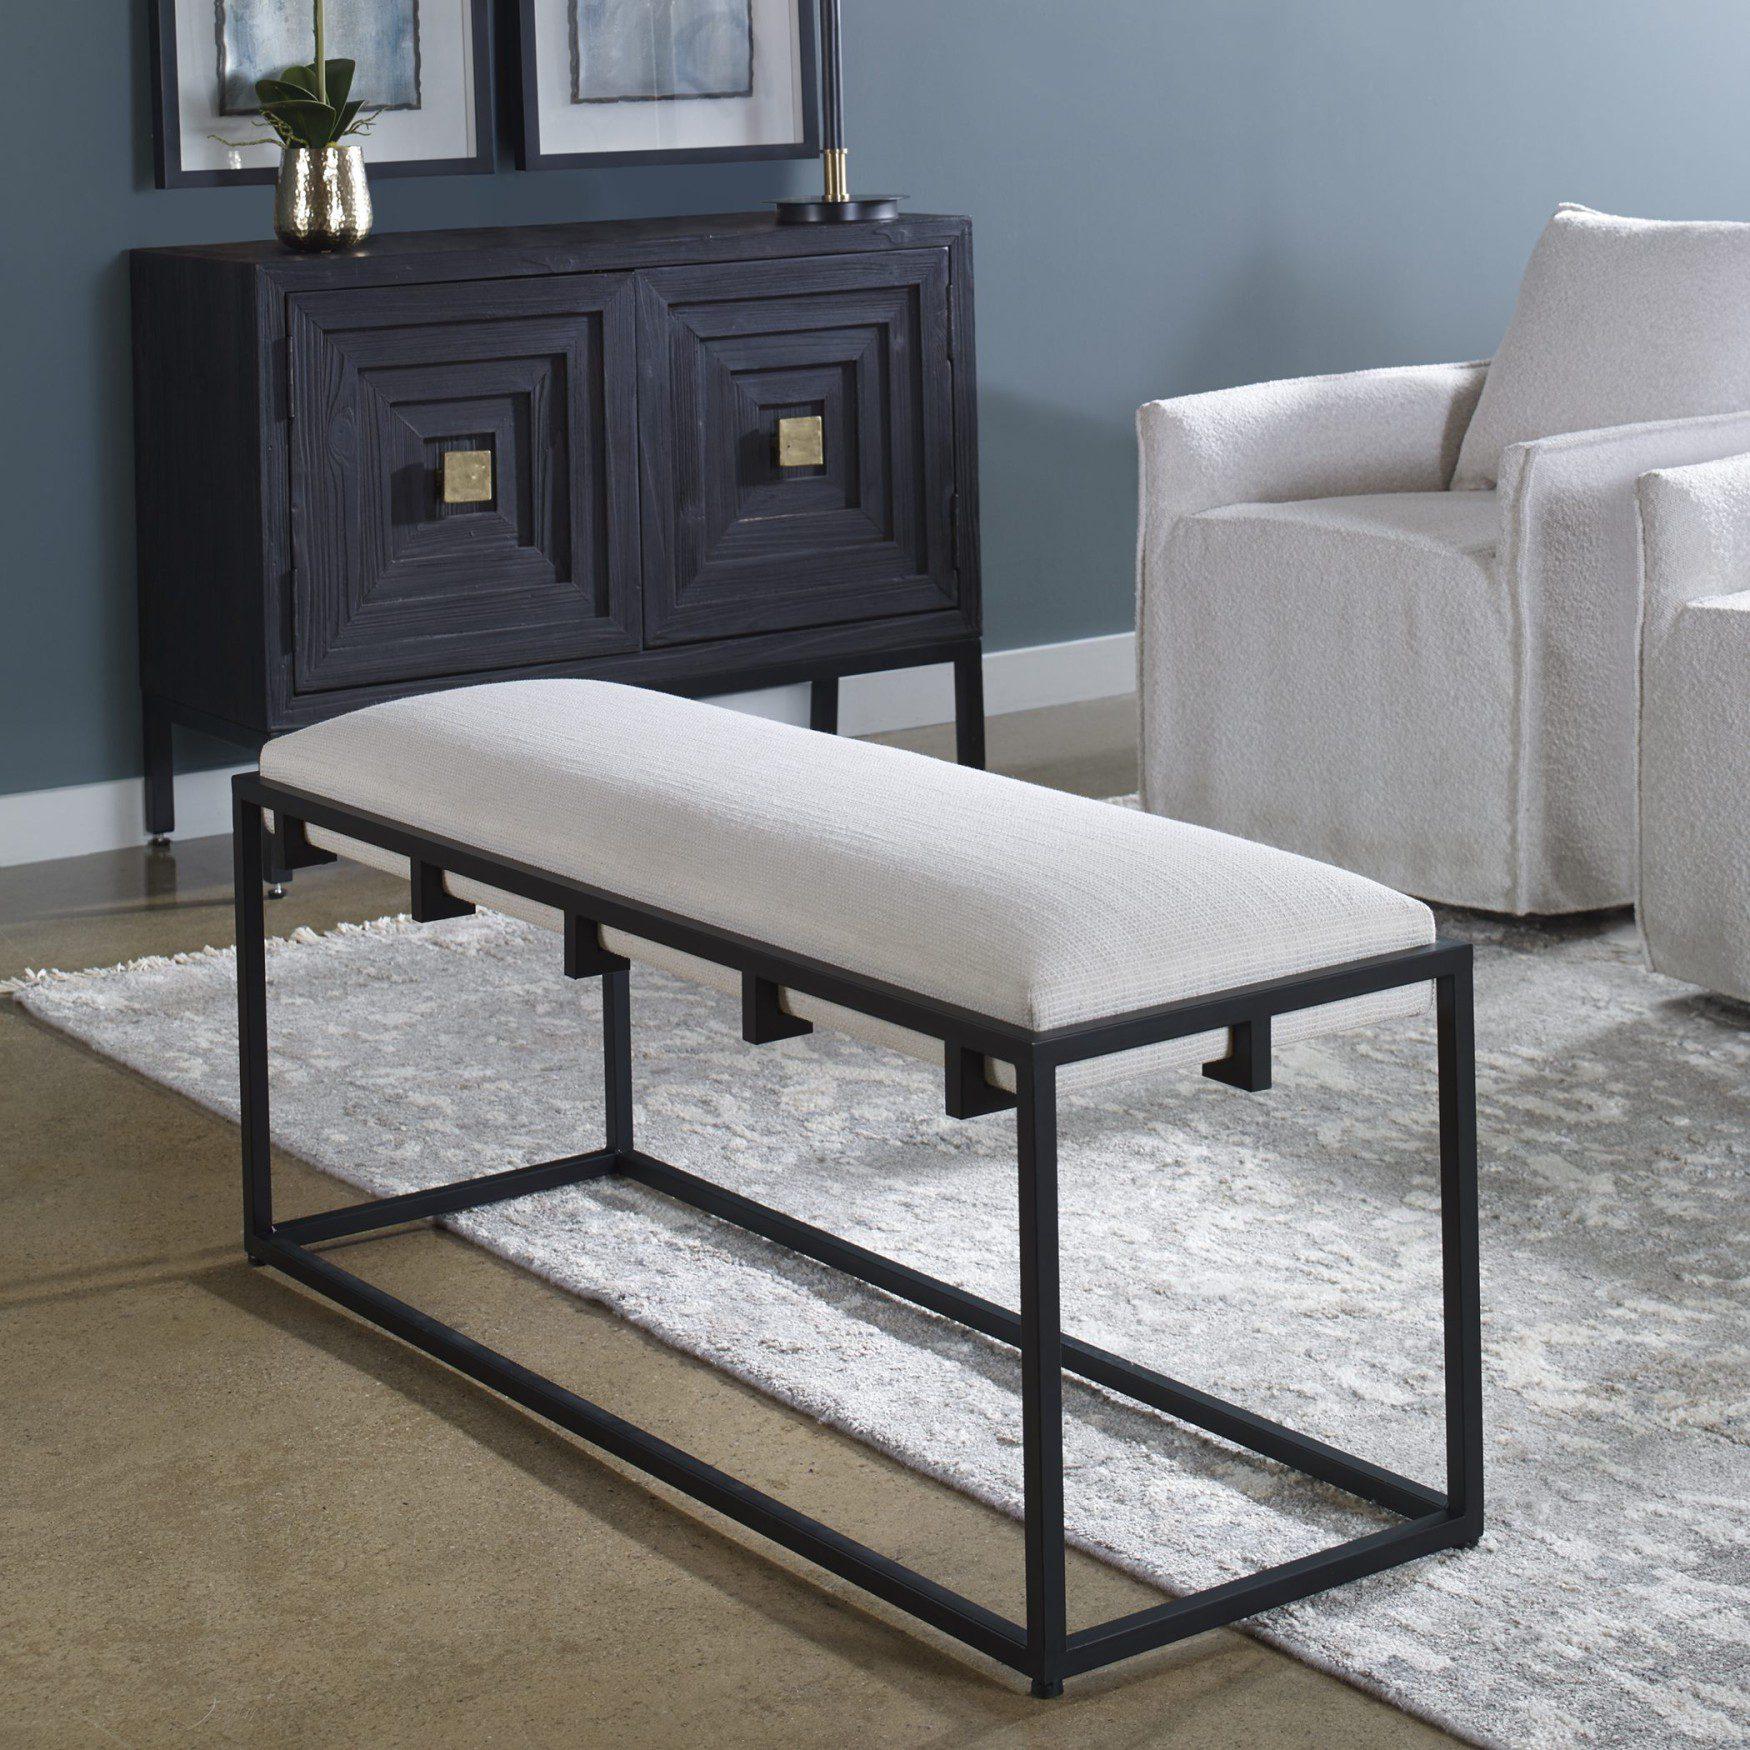 Uttermost Paradox Iron & Fabric Bench